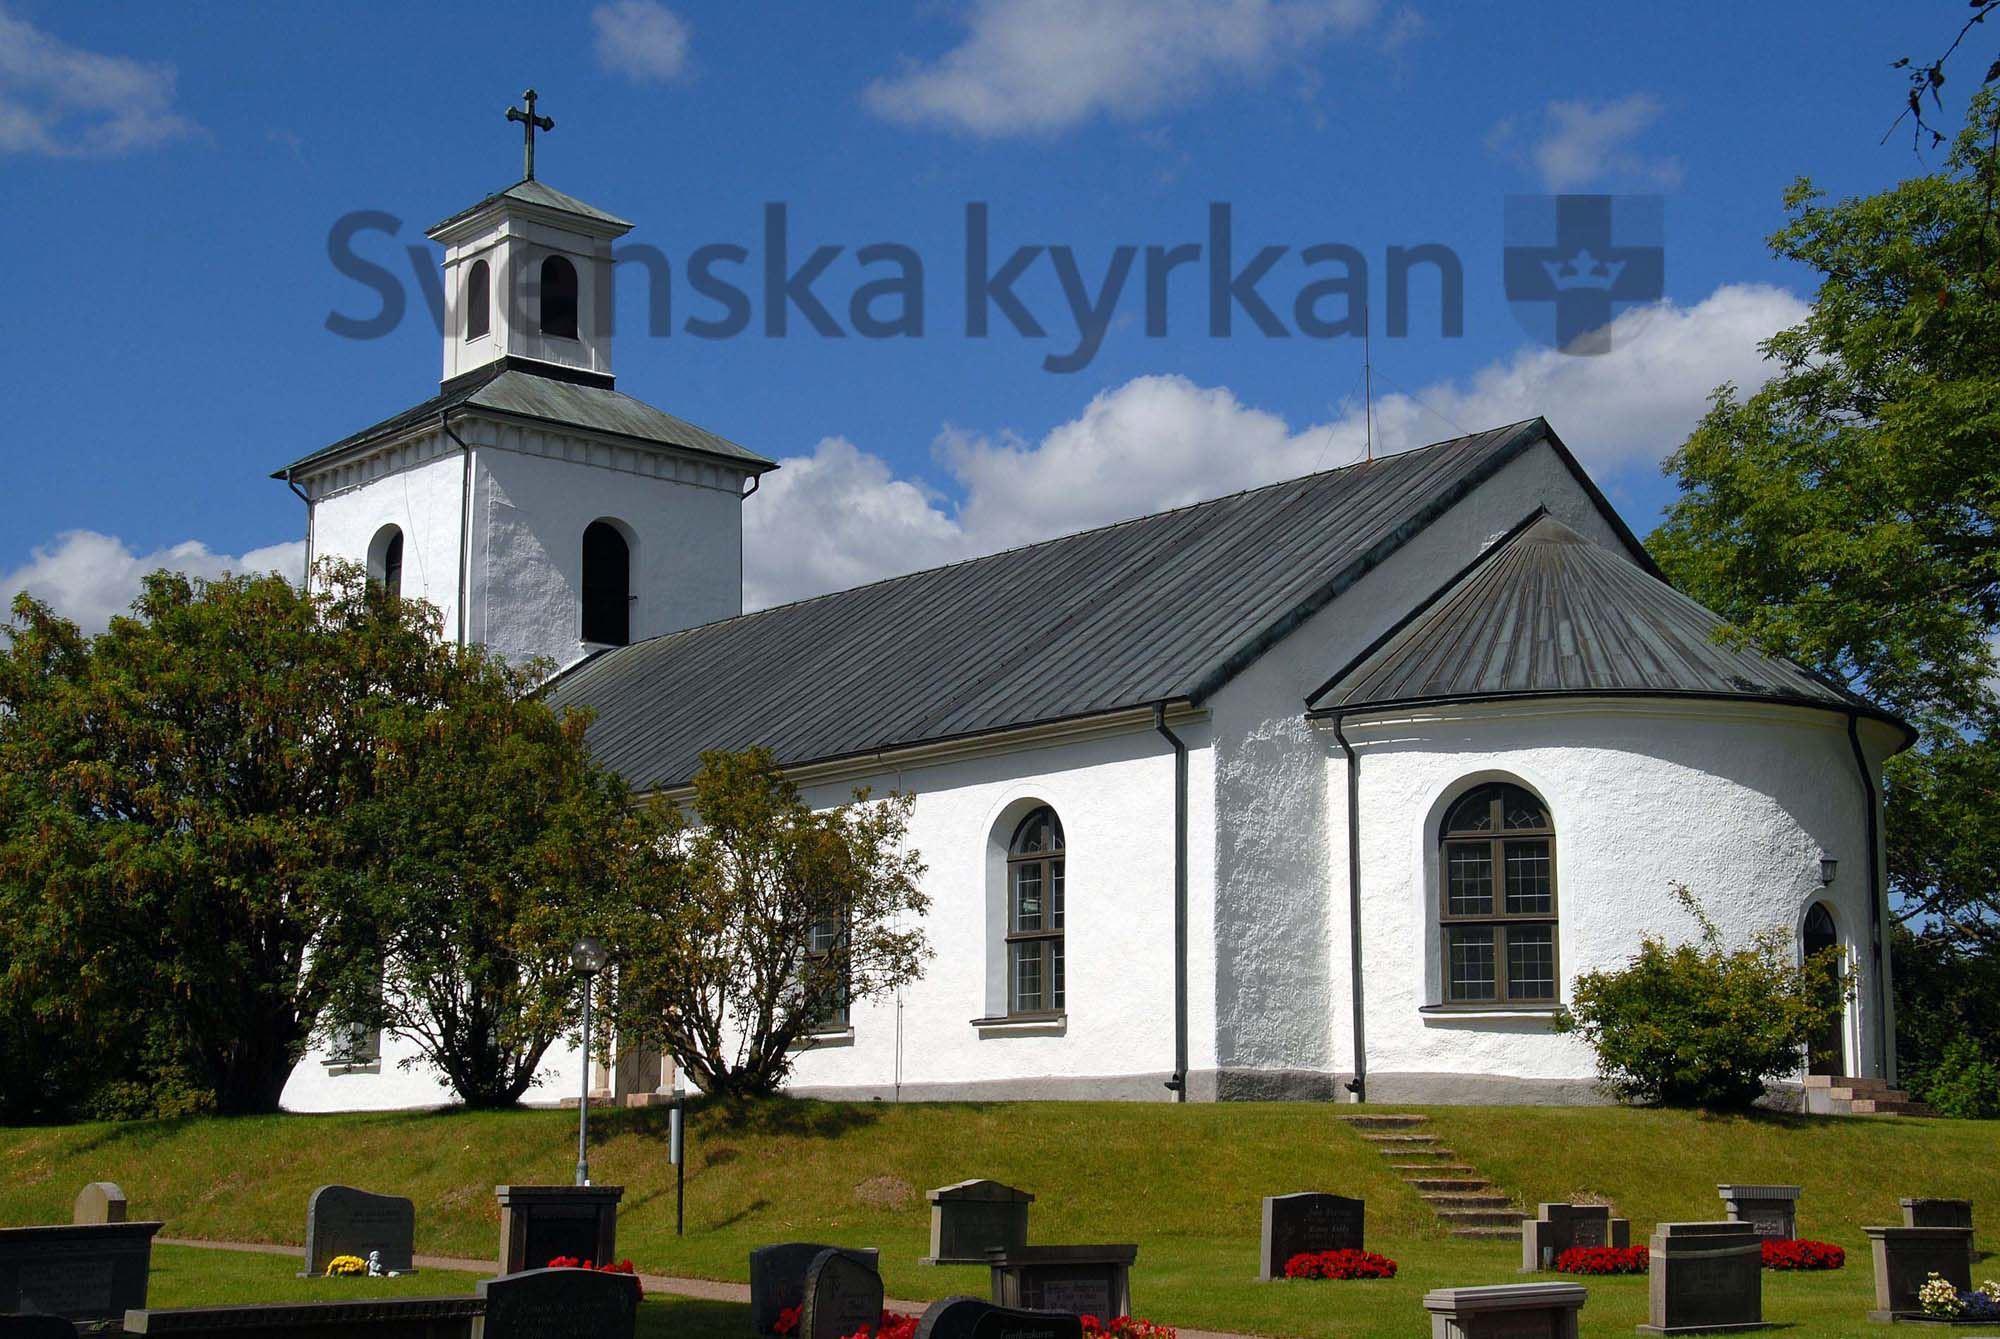 Bengt-Åke Fasth, Annerstad kyrka